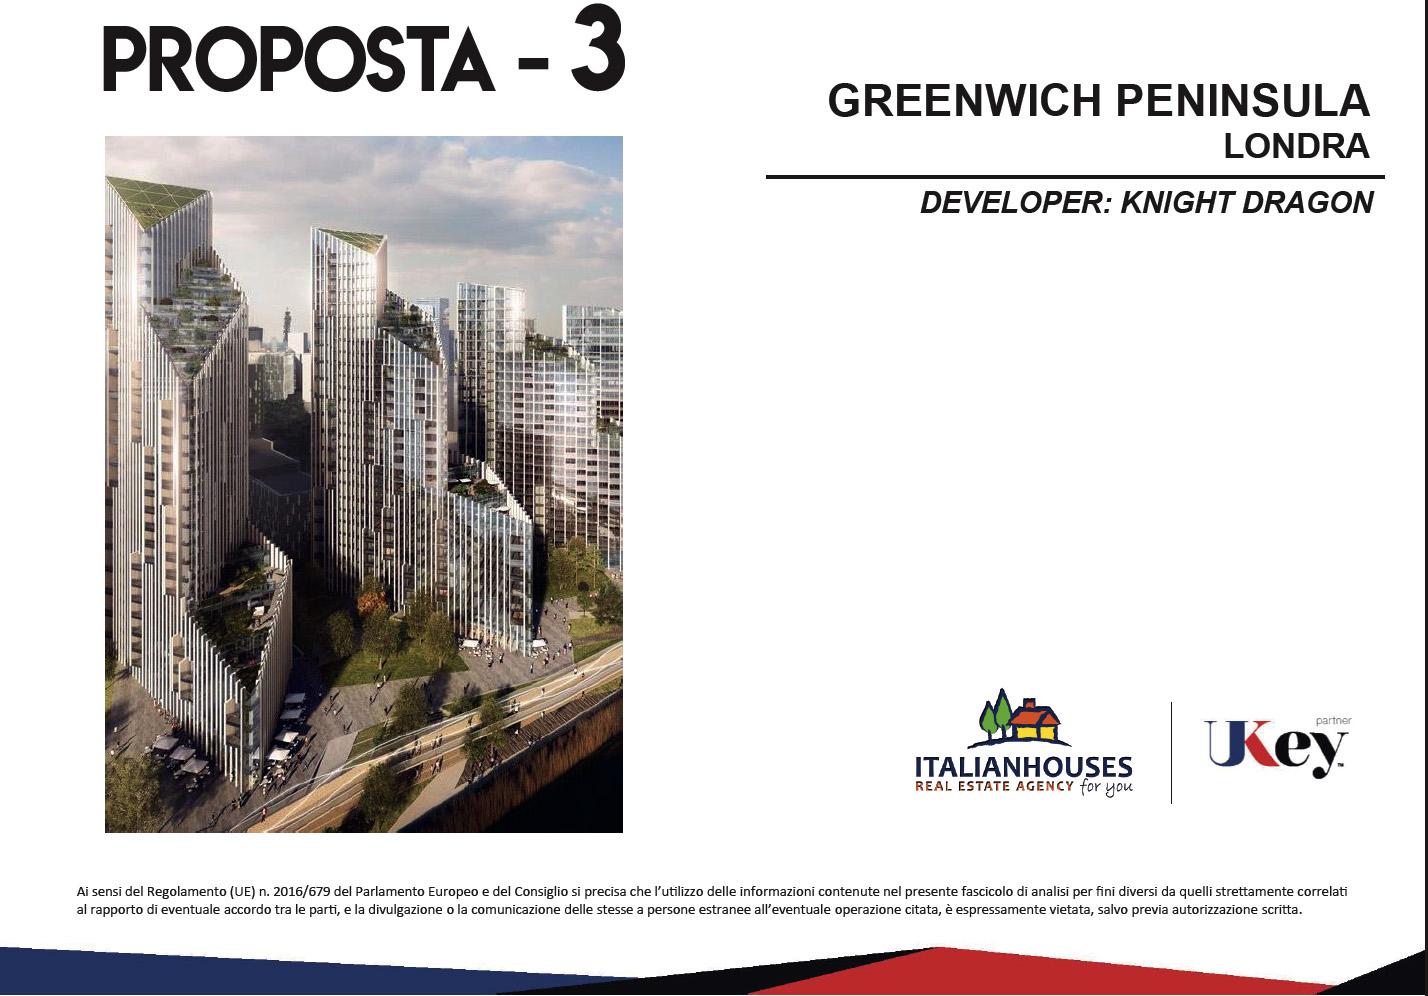 GREENWICH PENINSULA LONDRA – DEVELOPER: KNIGHT DRAGON